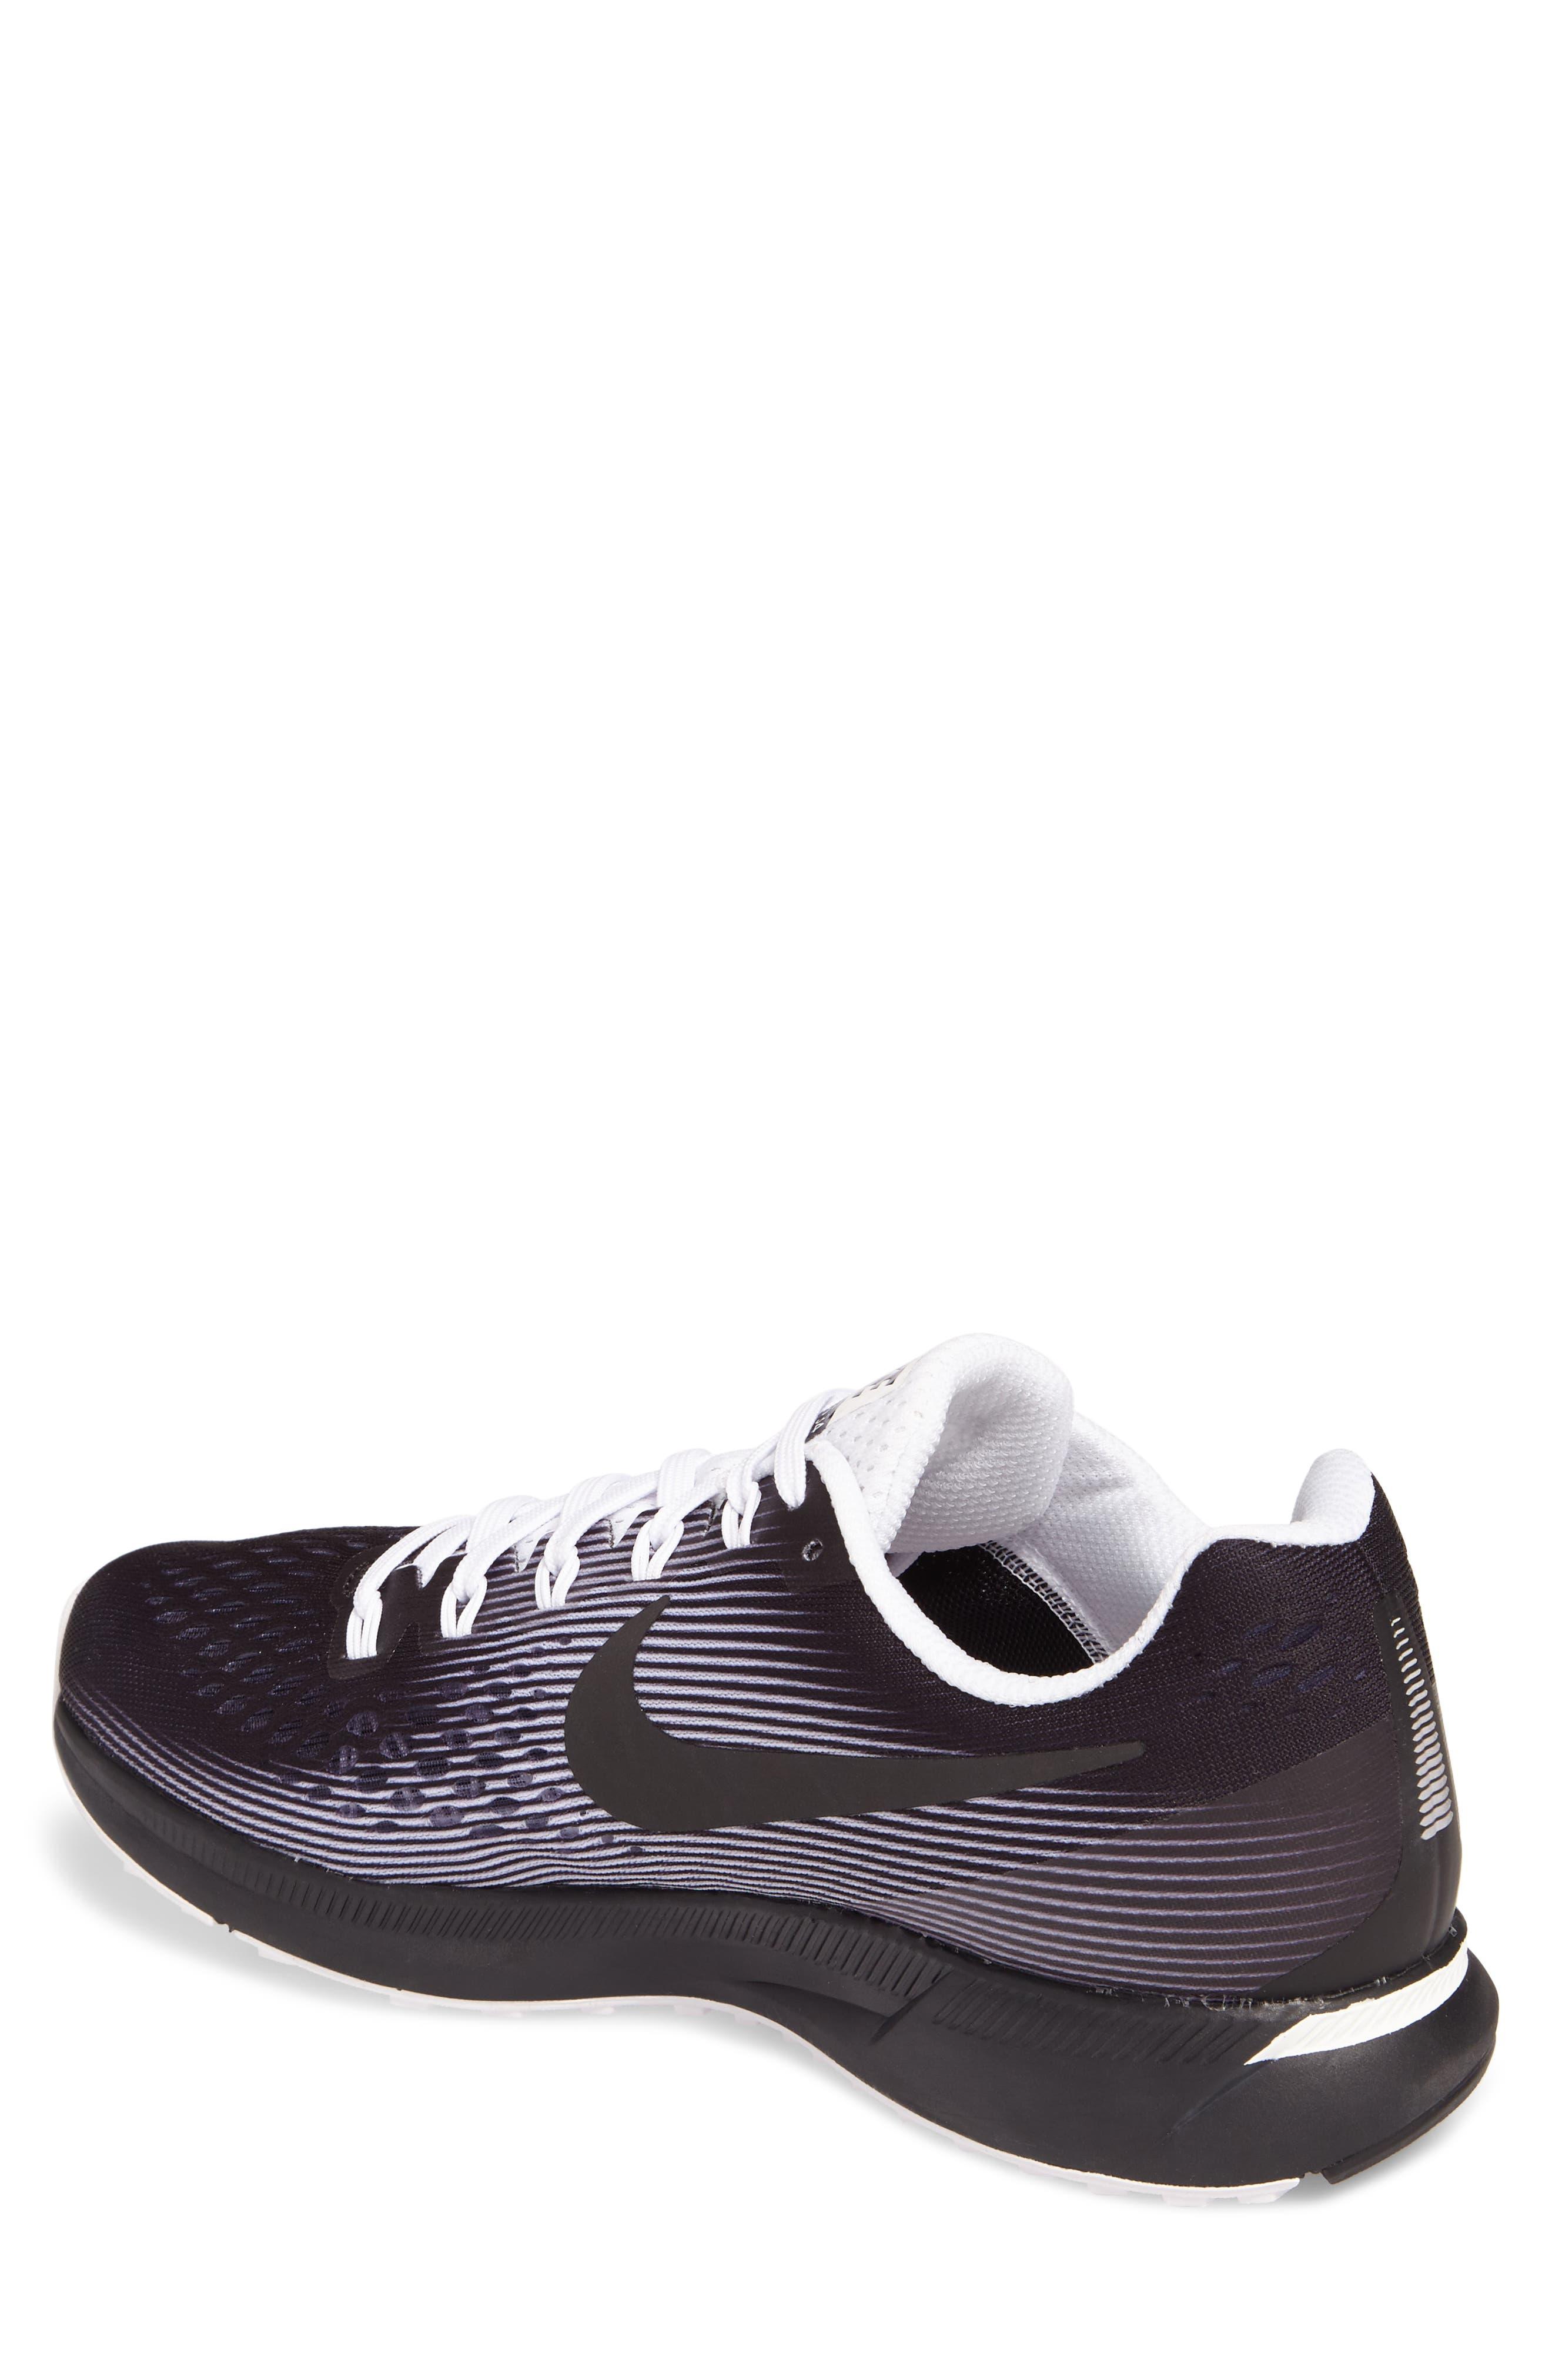 Alternate Image 2  - Nike Air Zoom Pegasus 34 LE Running Shoe (Men)